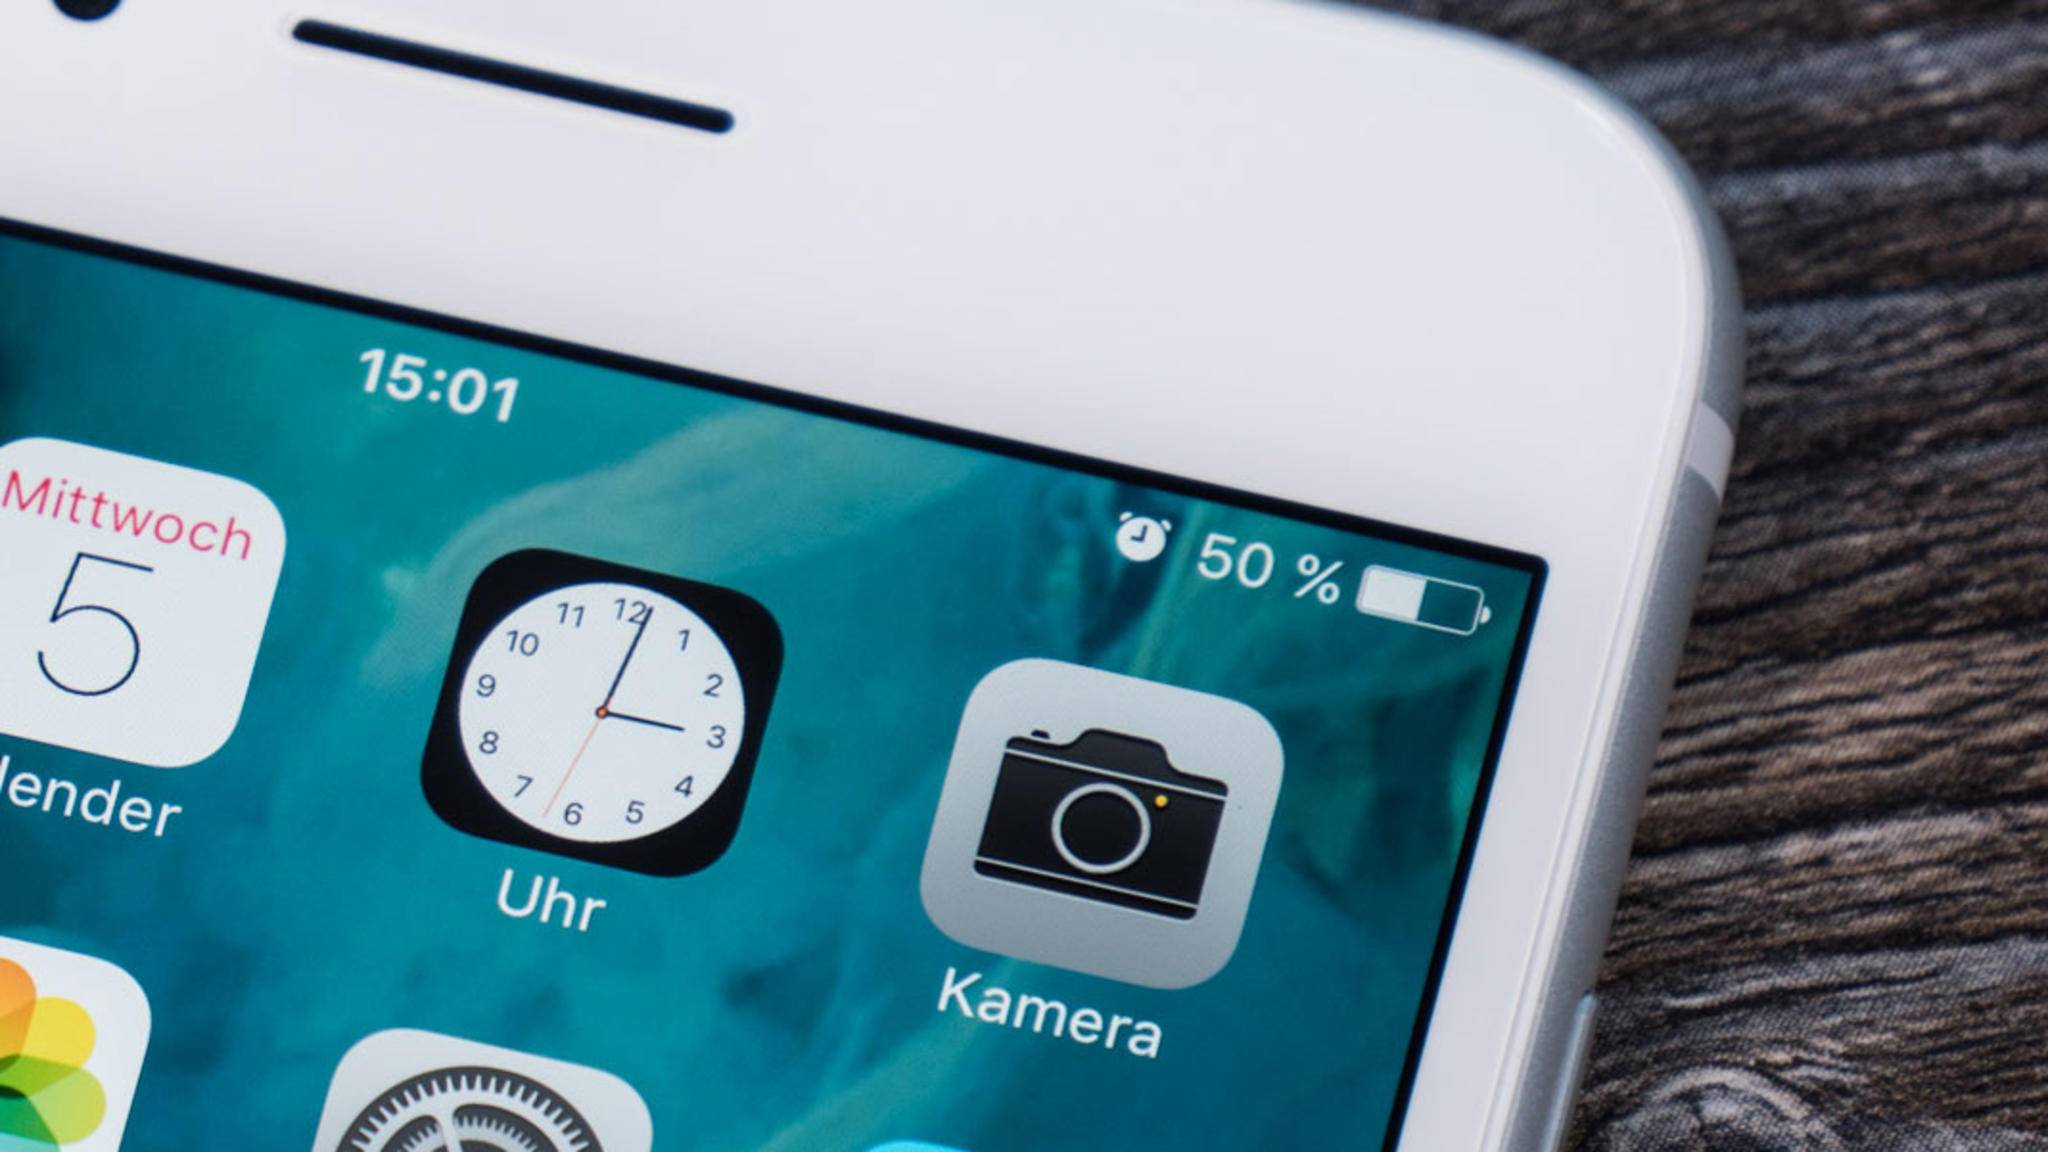 iOS 10.1.1 sorgt auf dem iPhone offenbar für Akku-Probleme.